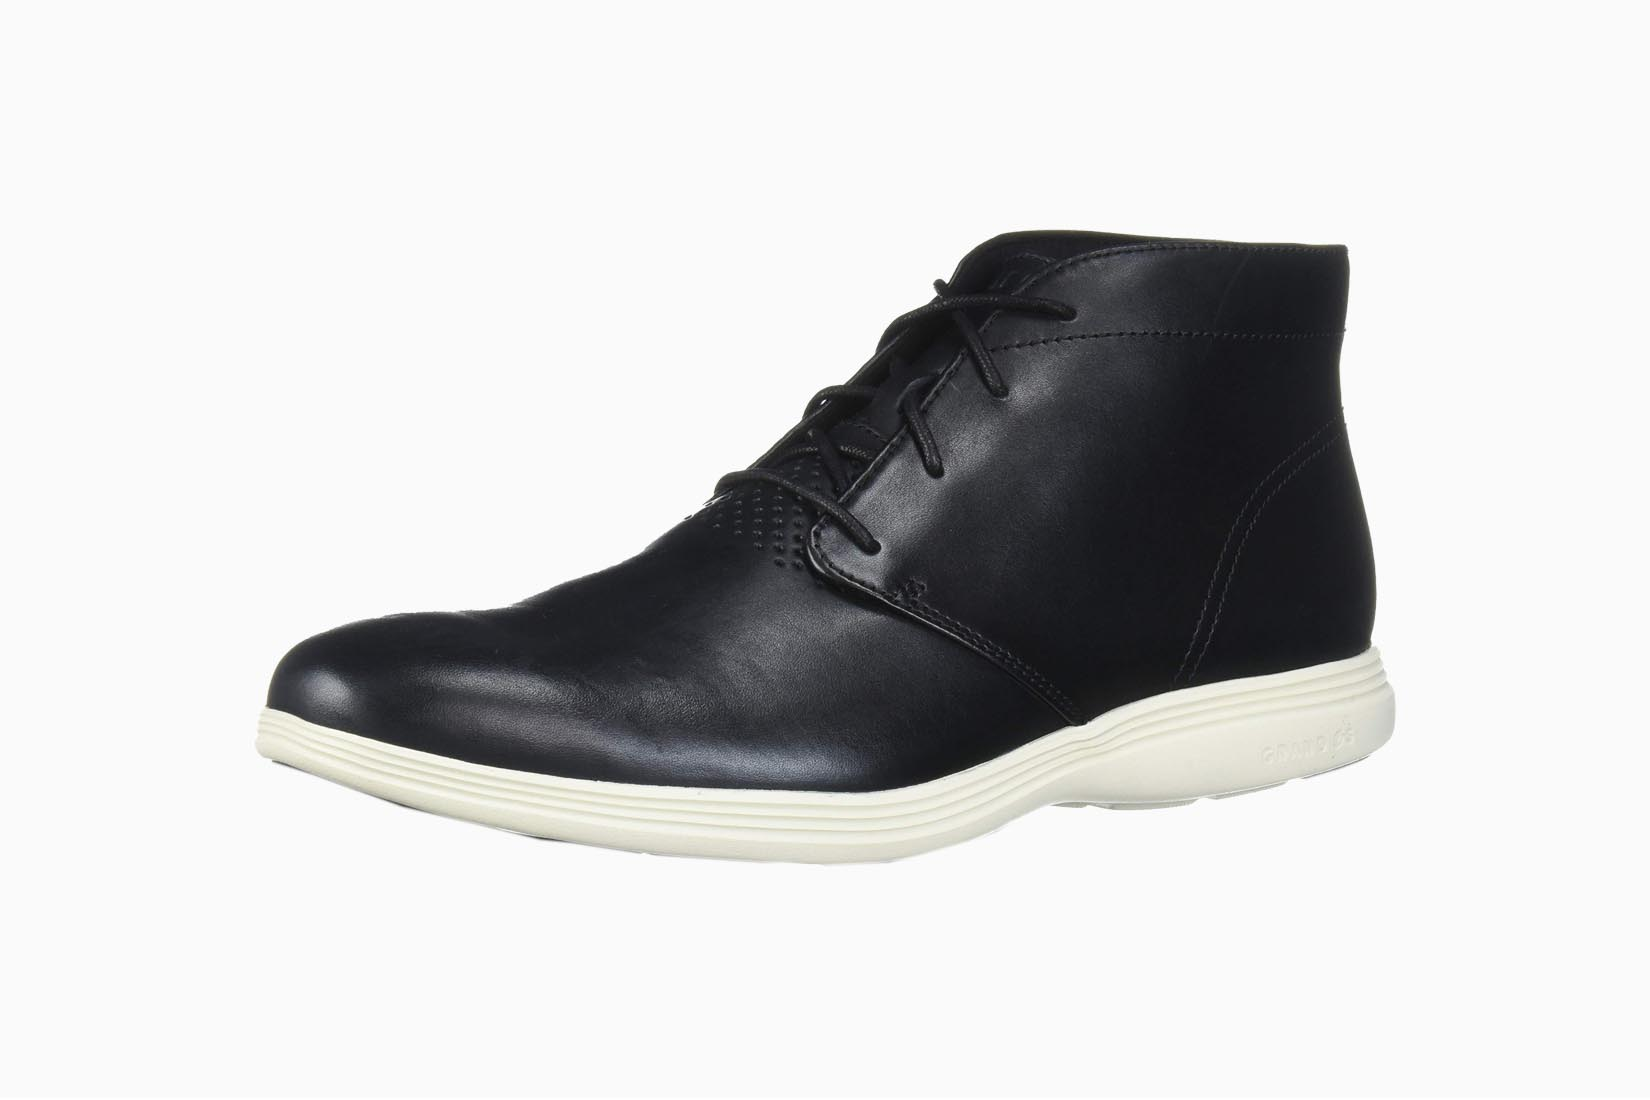 best boots men cole haan grand tour chukka boot review Luxe Digital